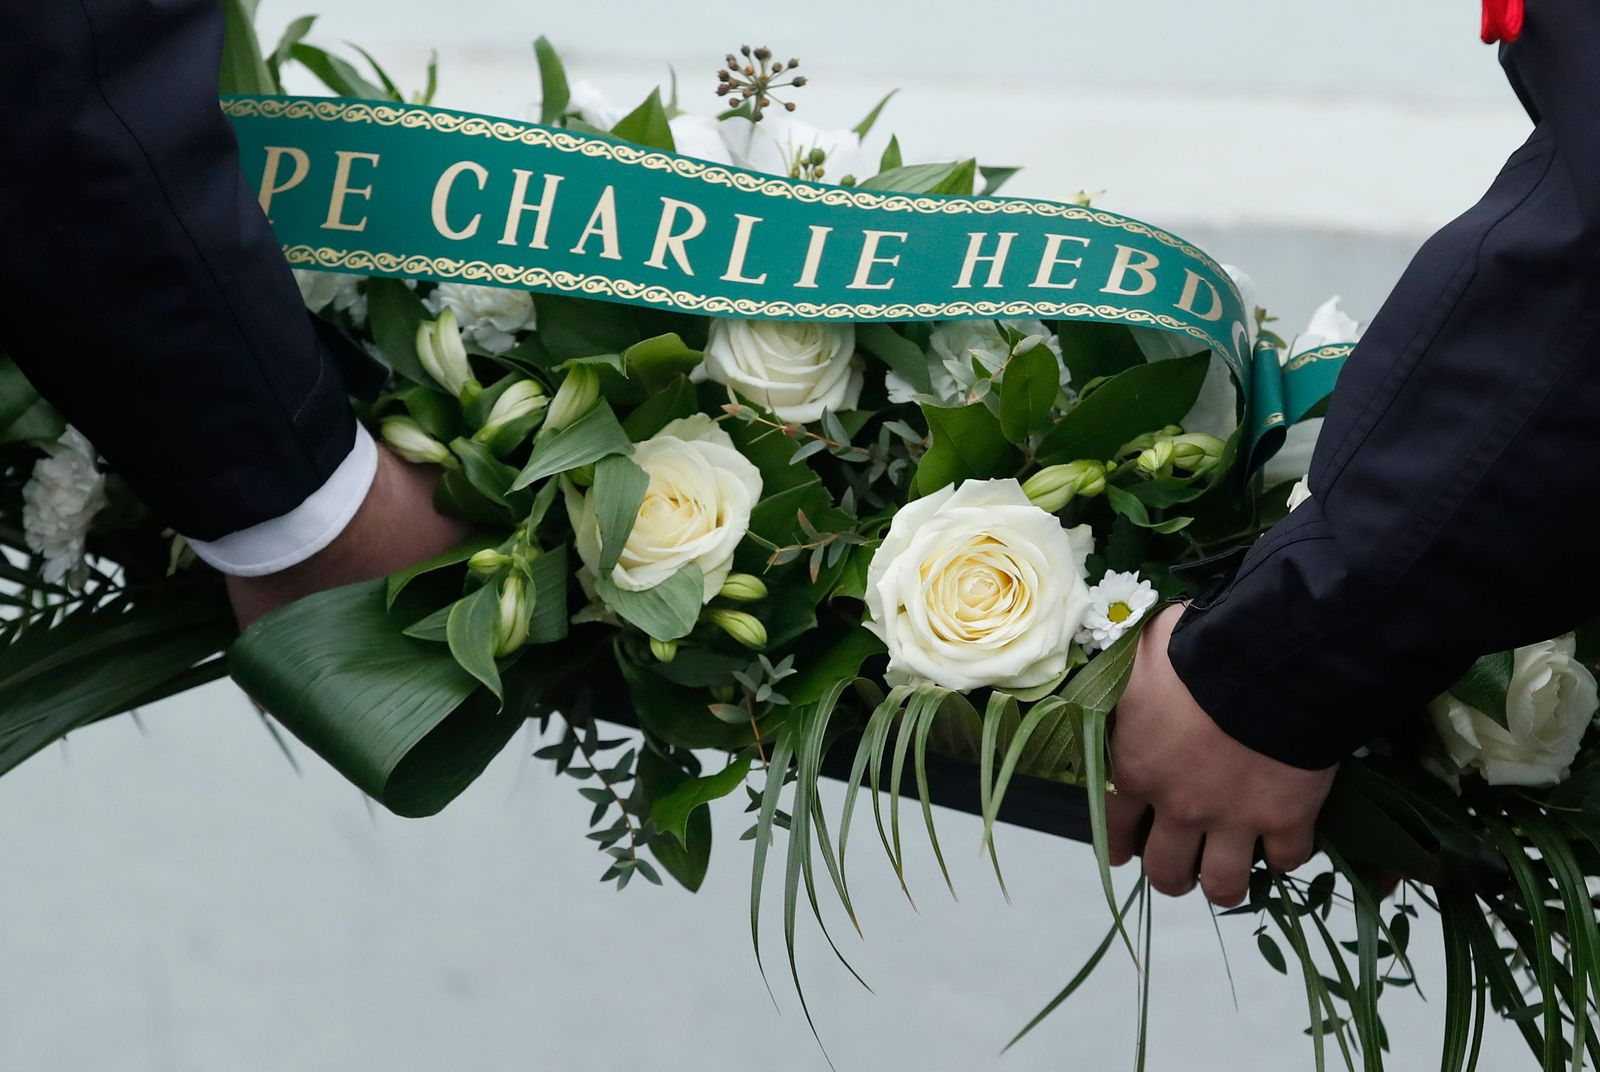 Charlie Hebdo Gedenken